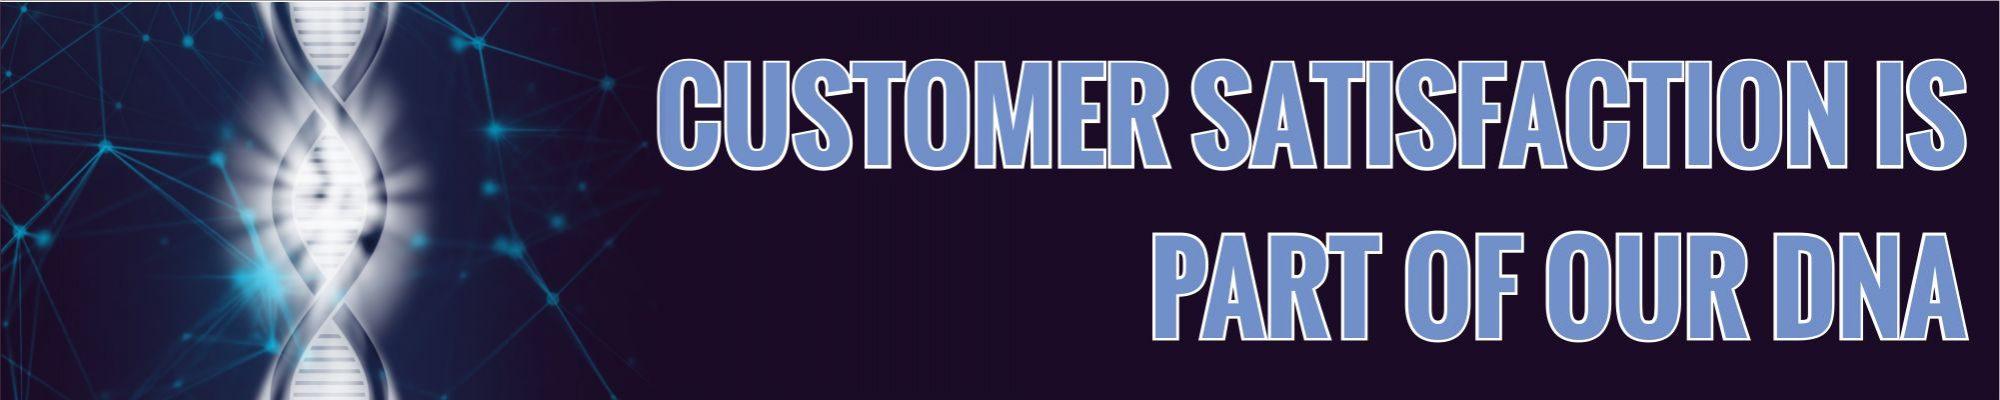 Sticky Sales and Marketing - Company Profile Header